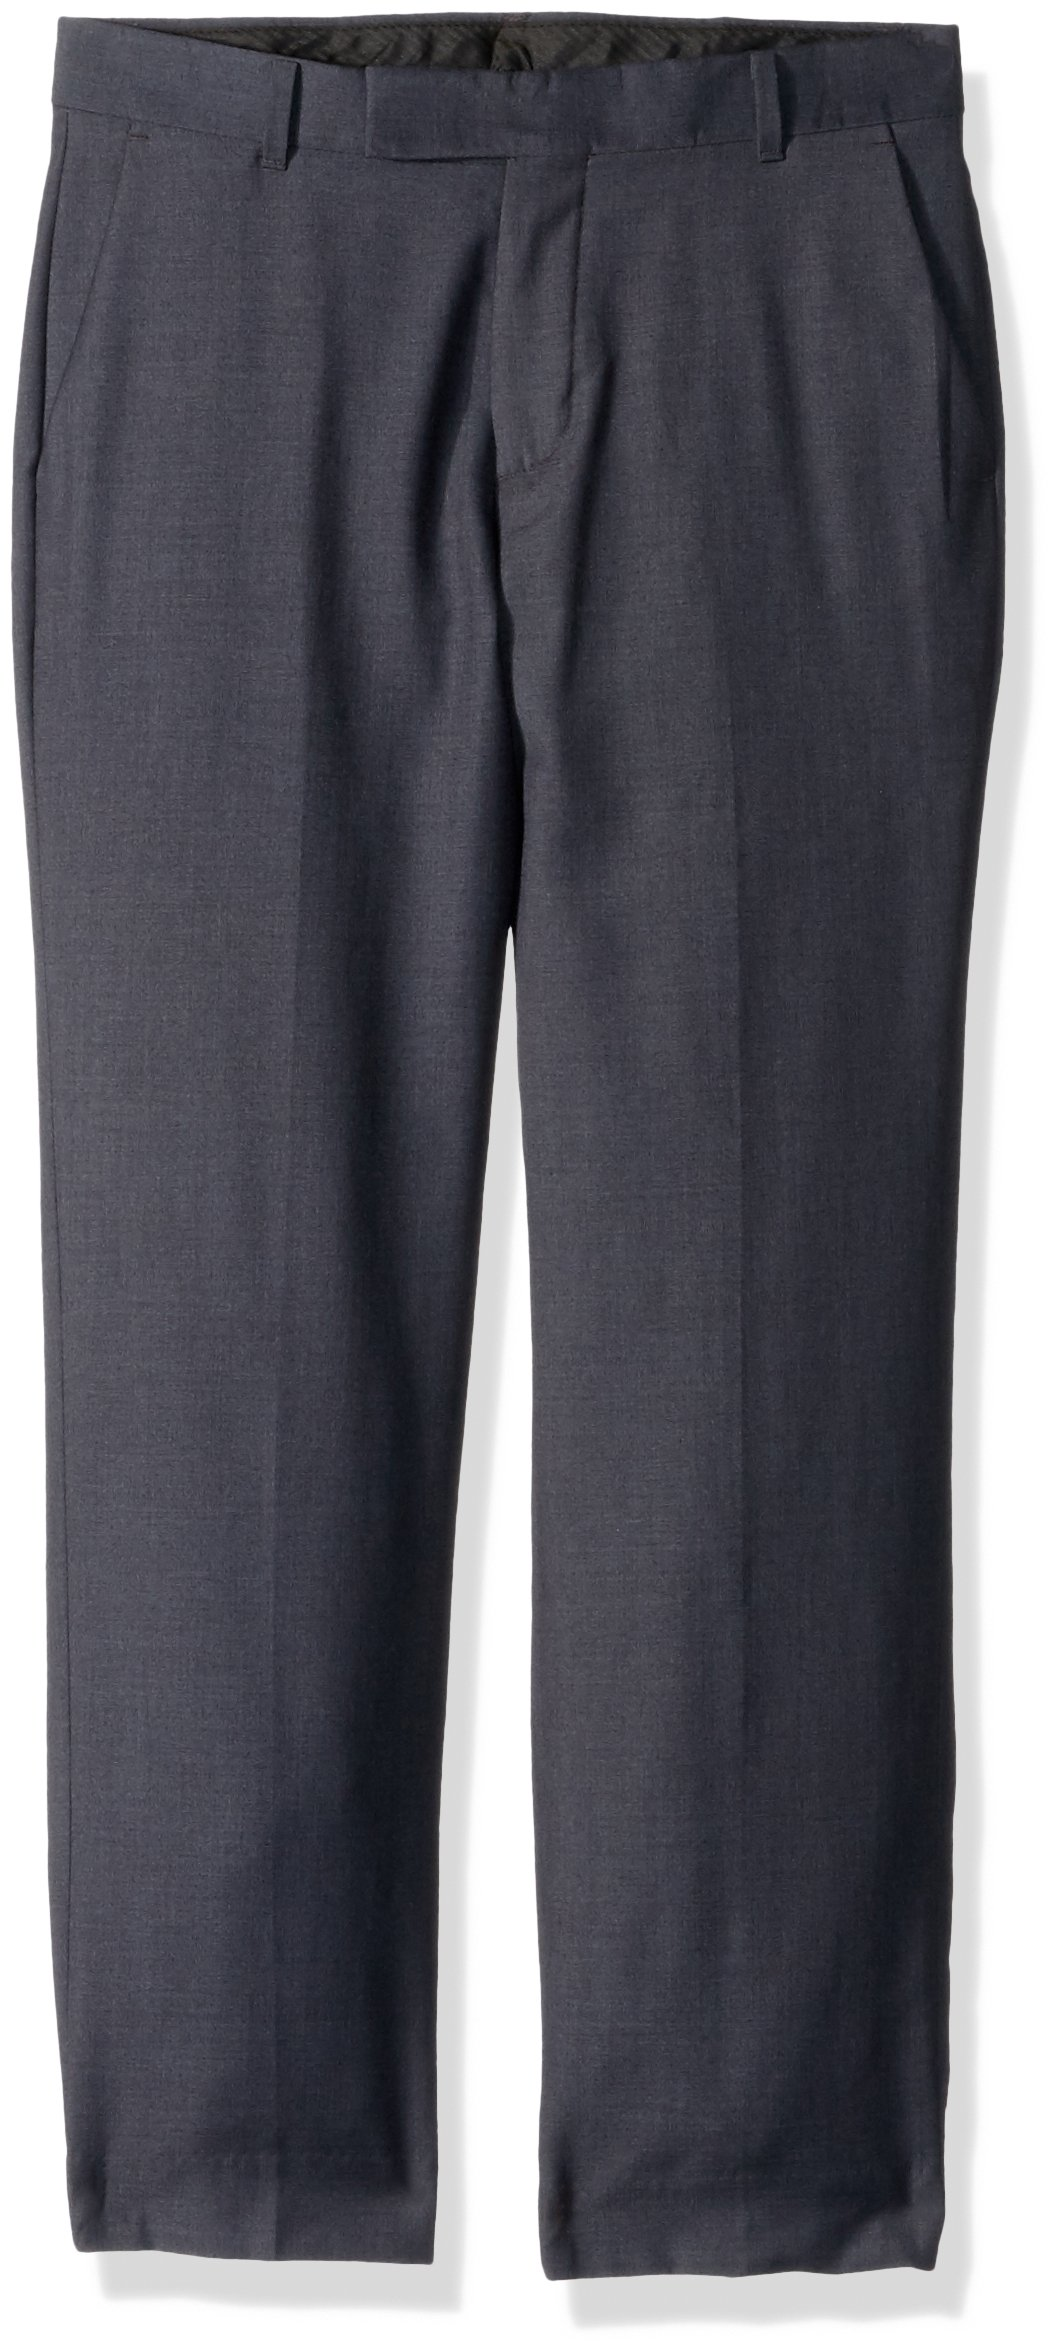 Calvin Klein Boys' Flat Front Dress Pant, Dark Charcoal Heather, 10